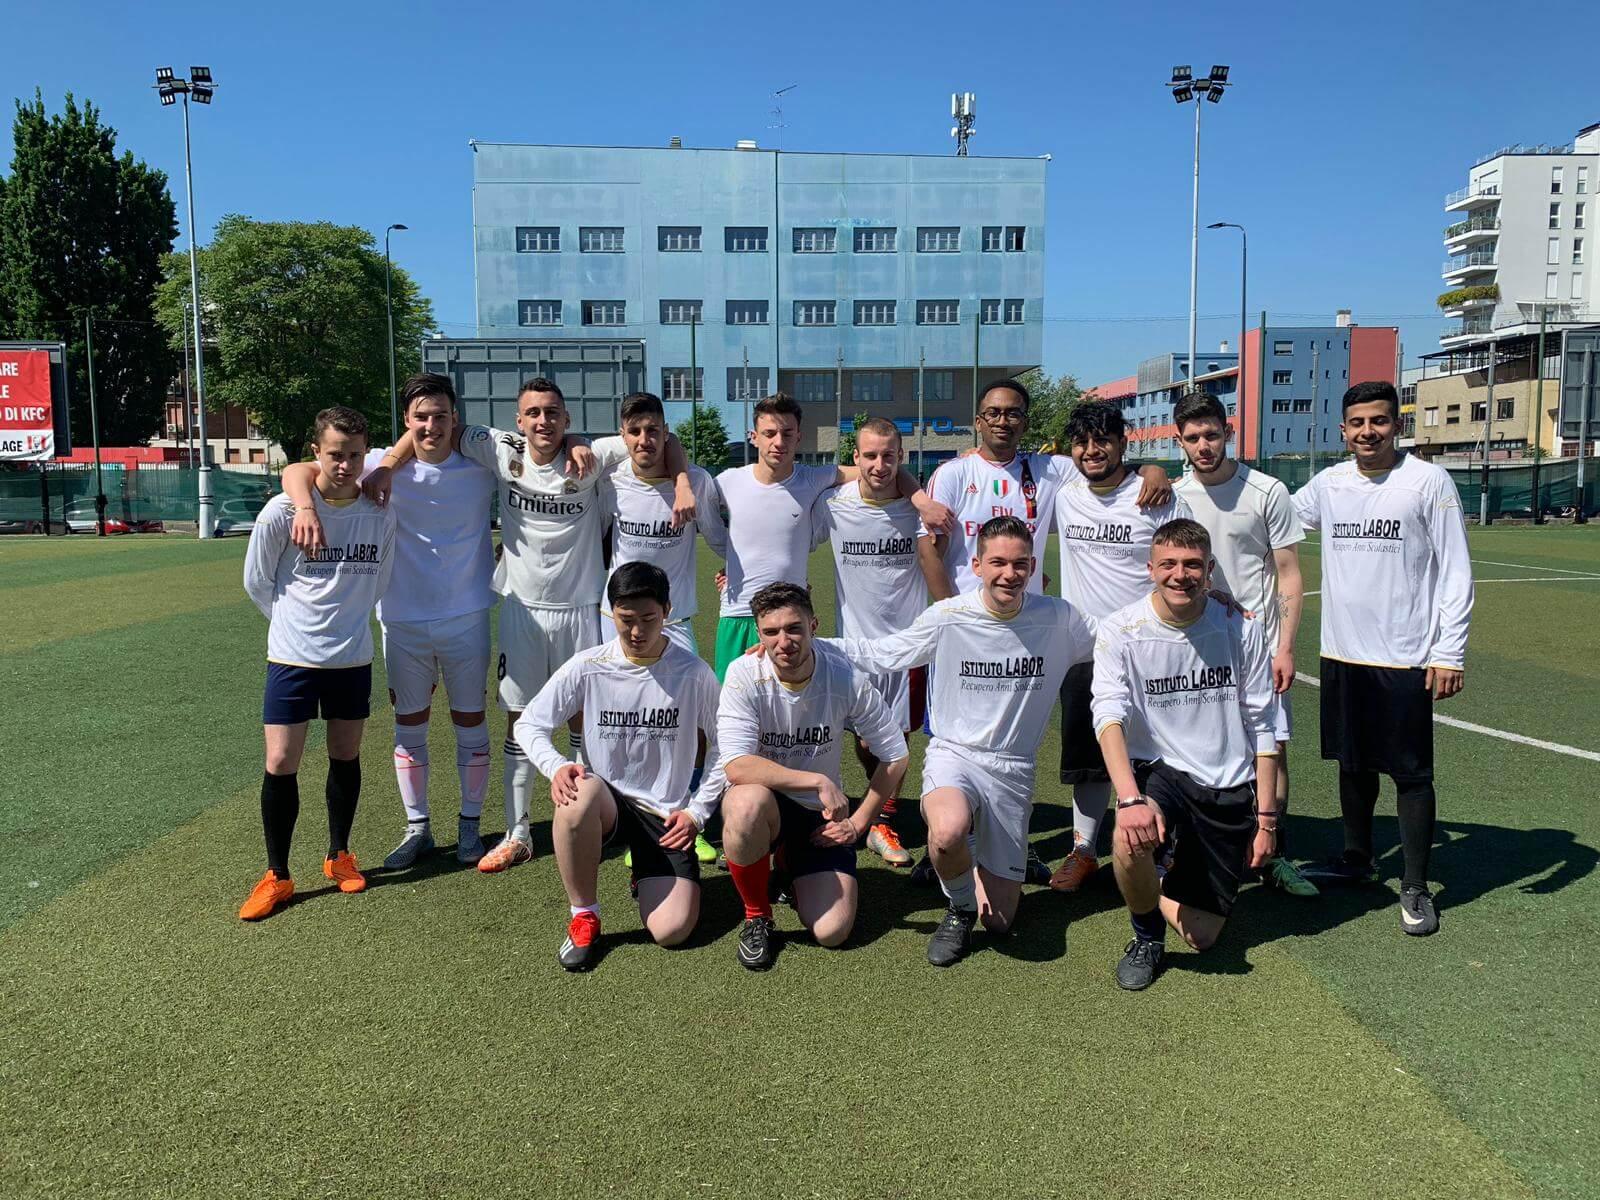 squadra bianca